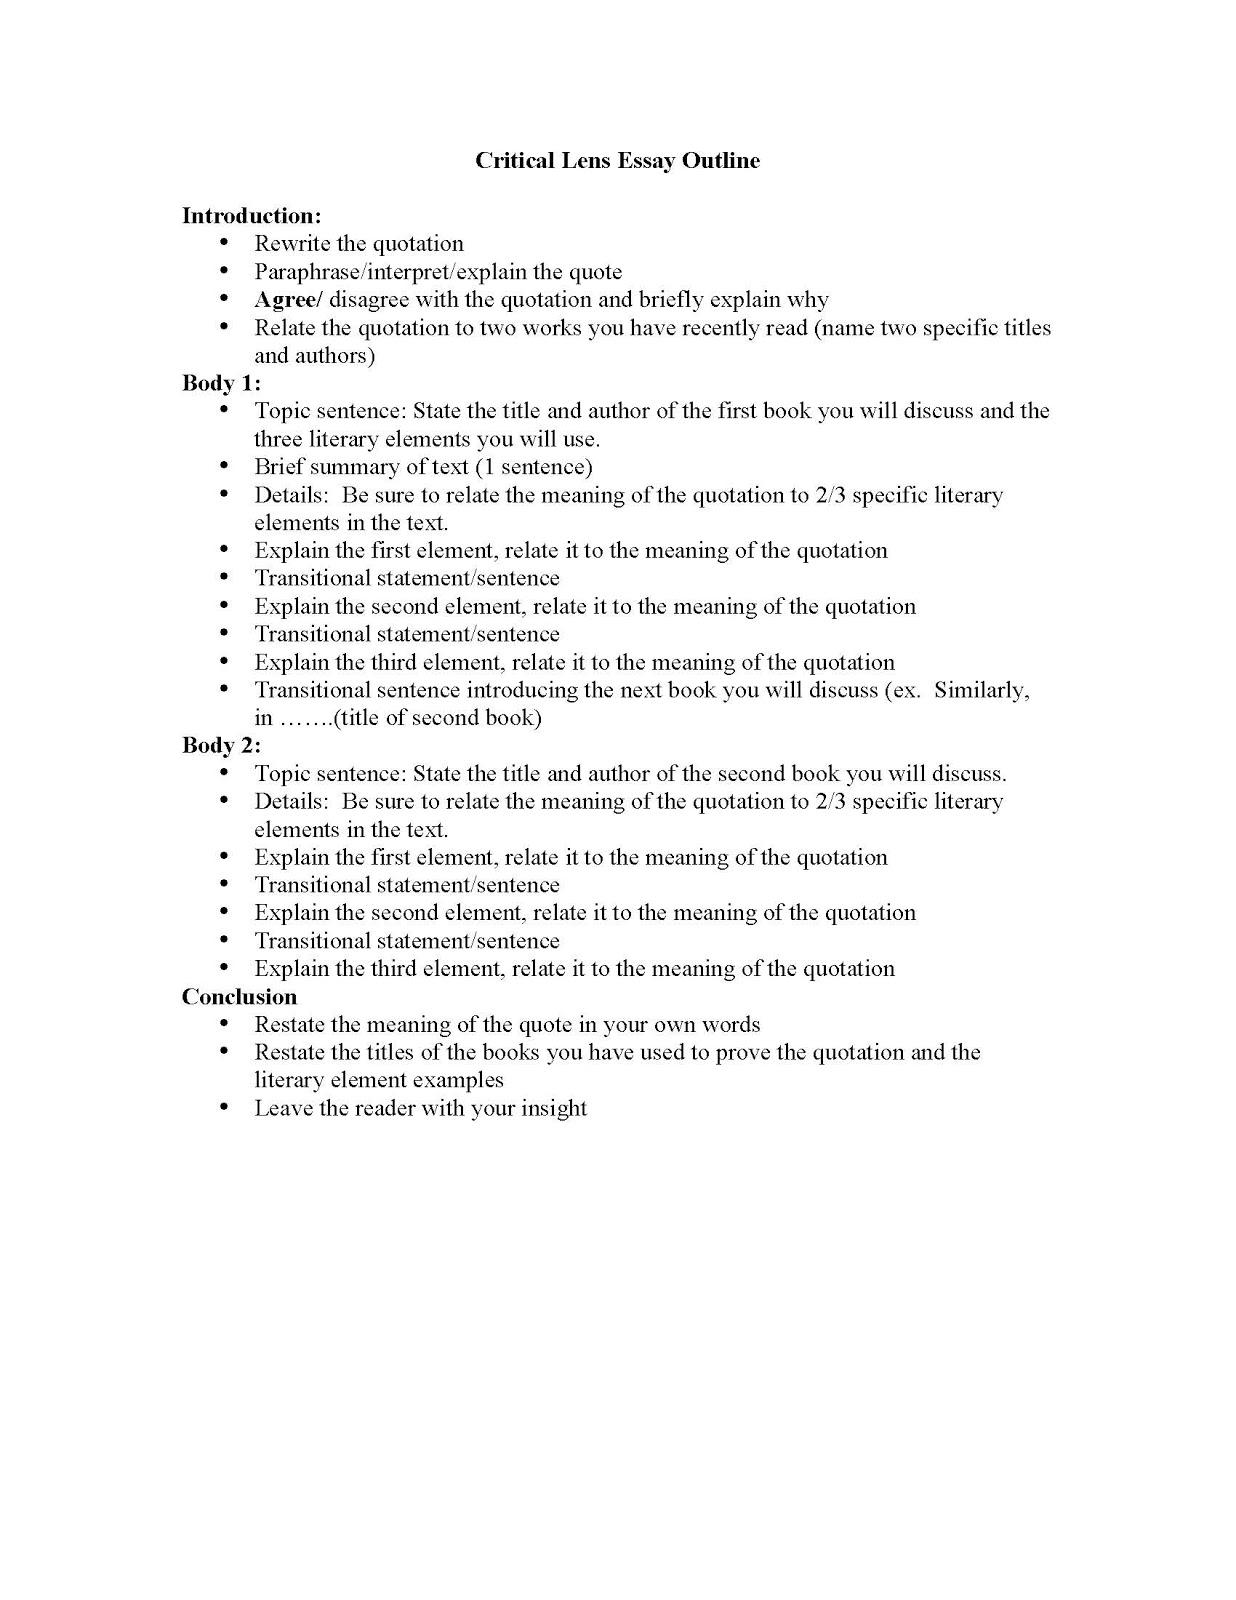 Prep prep - services Dissertation Services Dissertation